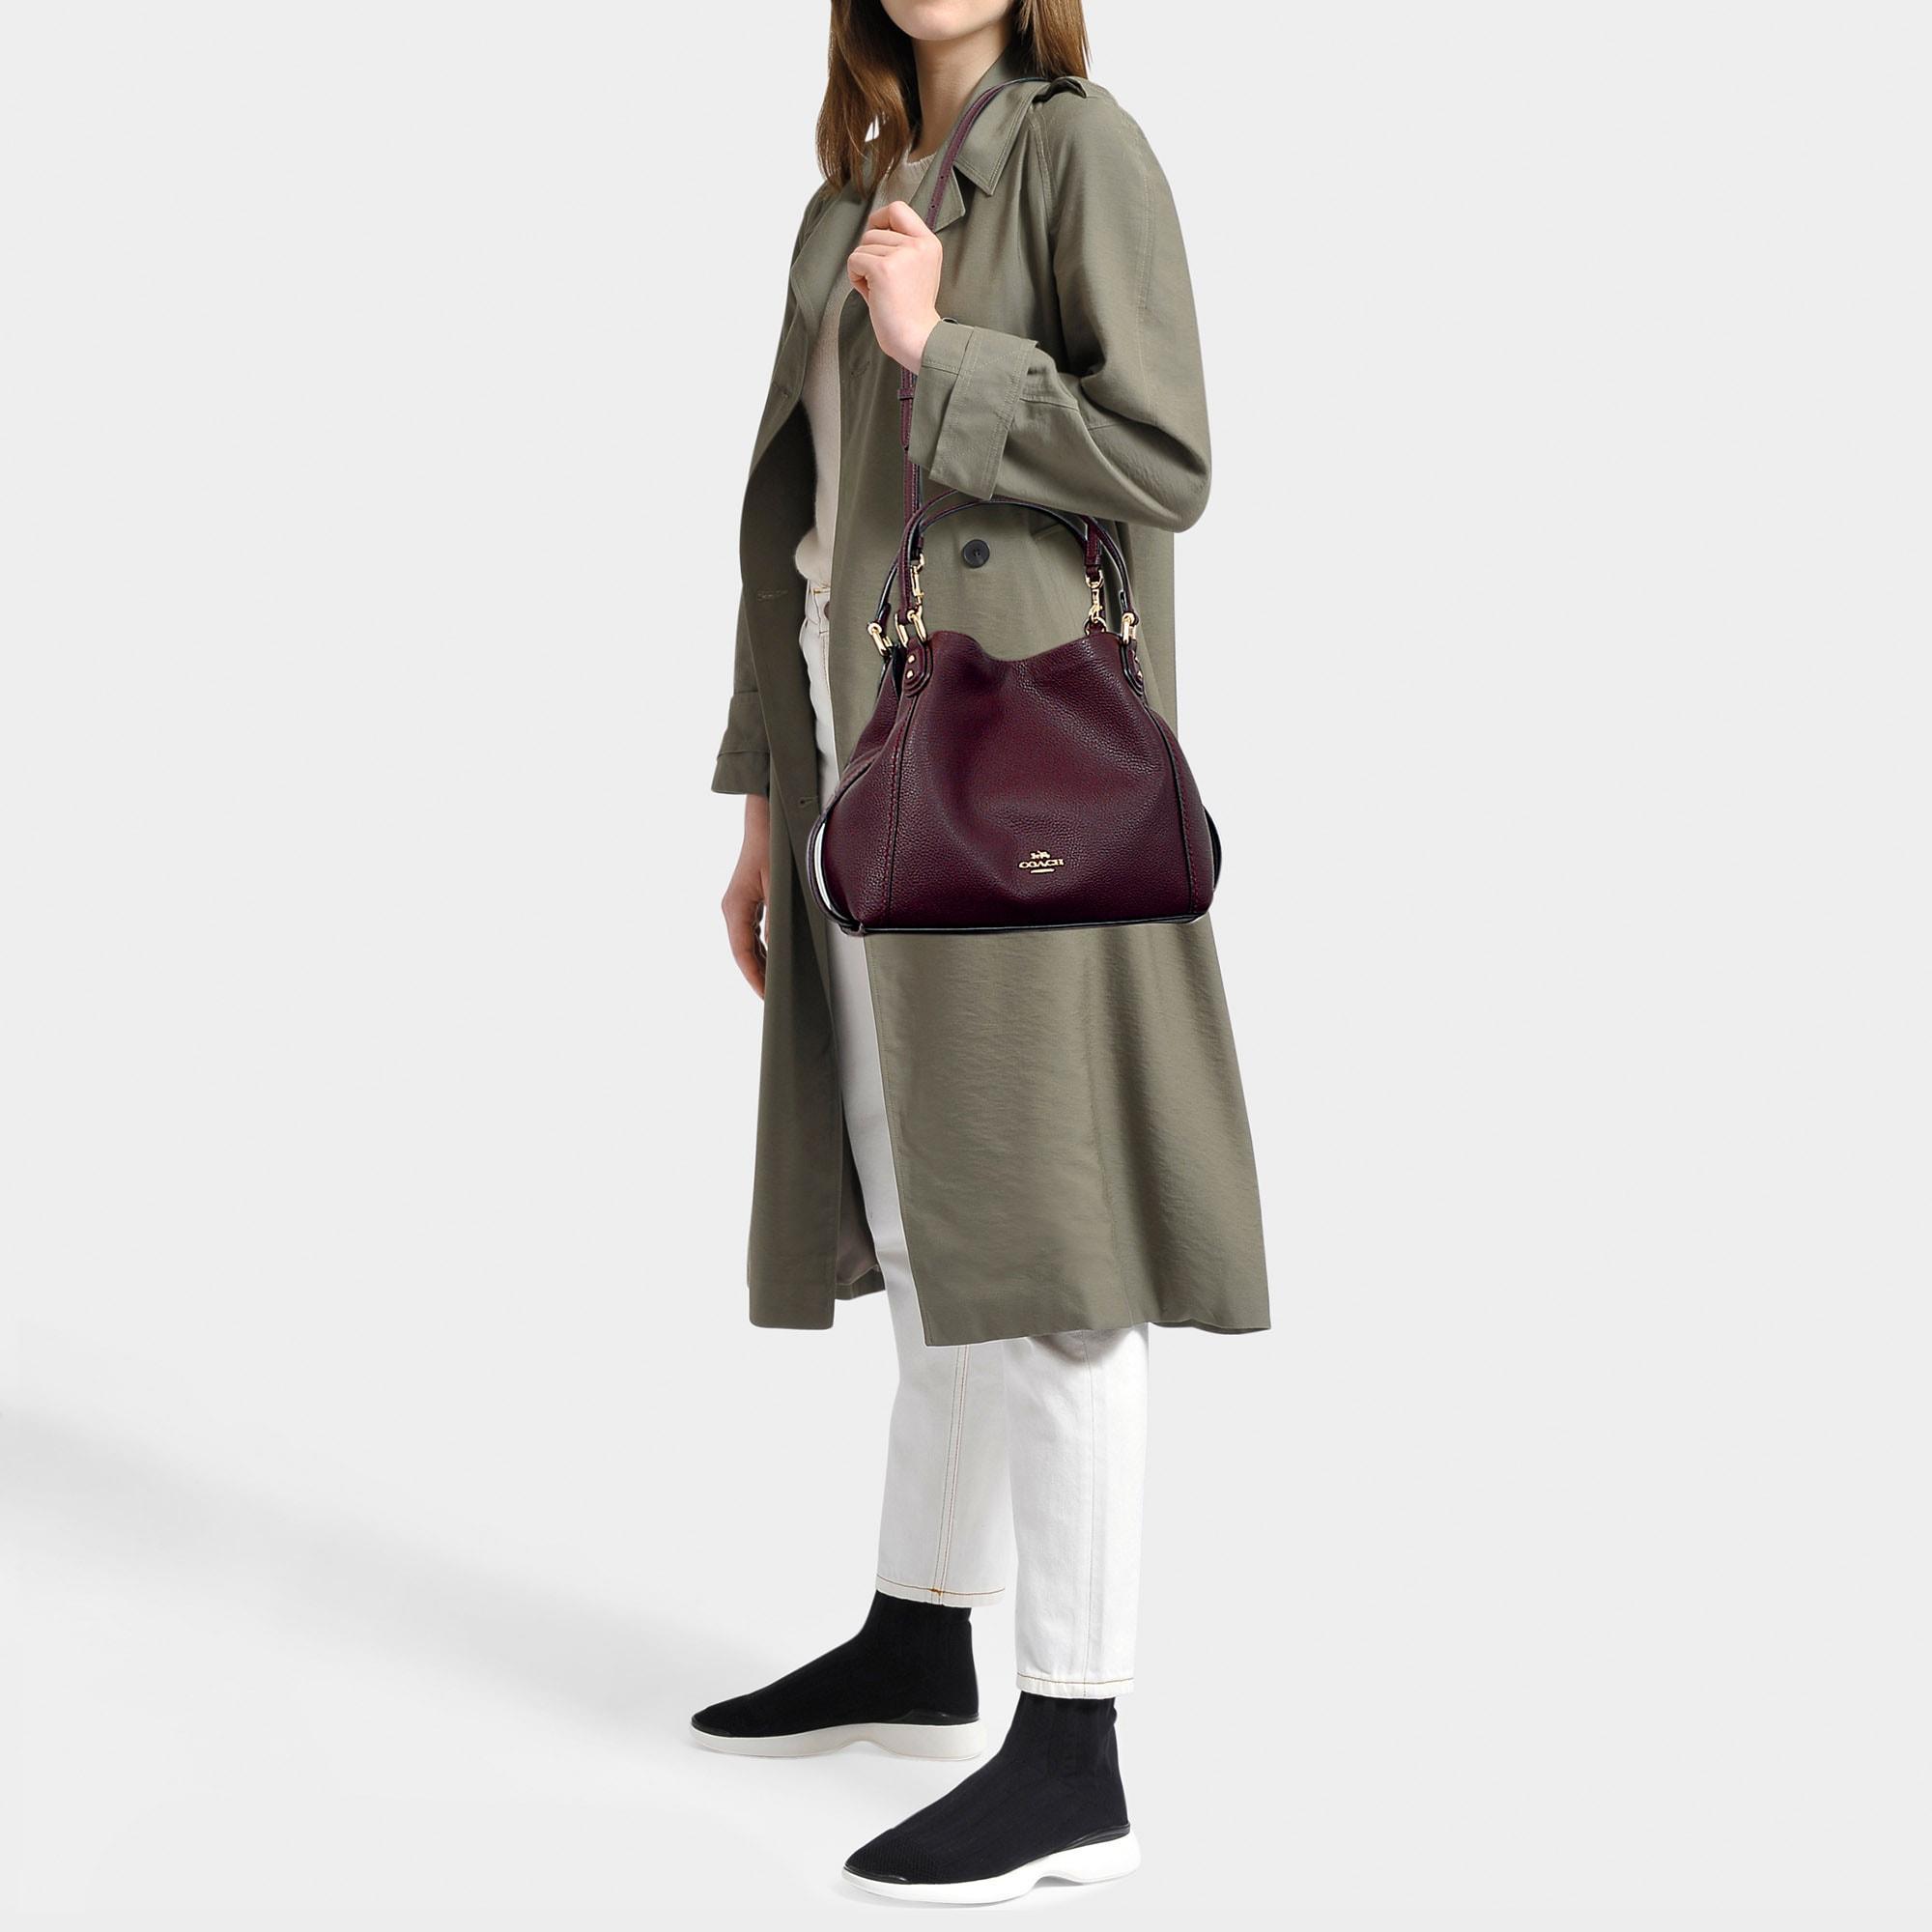 Polished Pebble Leather Edie 28 Shoulder Bag In Burgundy Calfskin